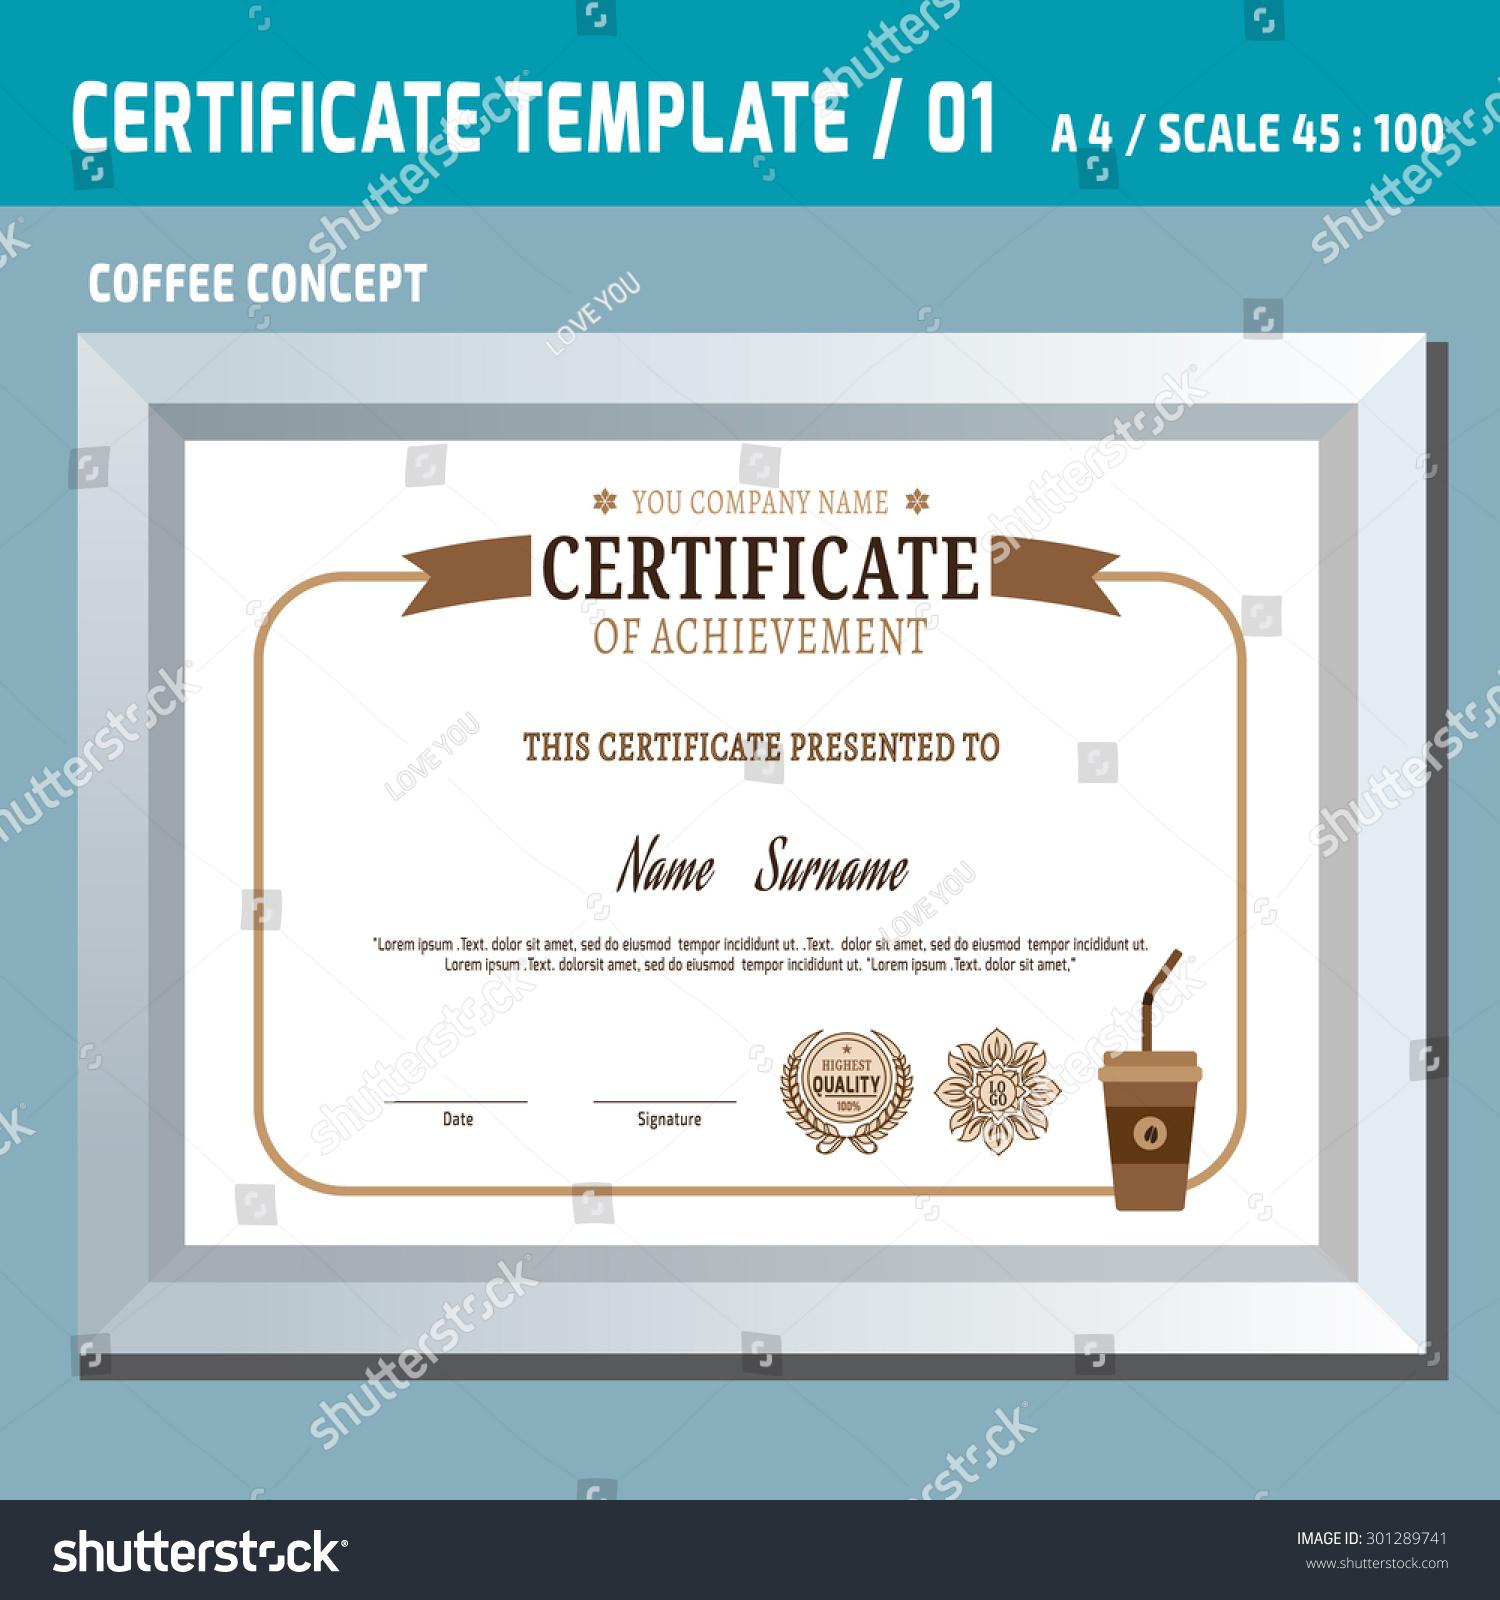 Certificate templatecoffeea 4 vector design template vintage stock certificate templateffeea4 vector design template vintage retro frame diploma background yadclub Gallery